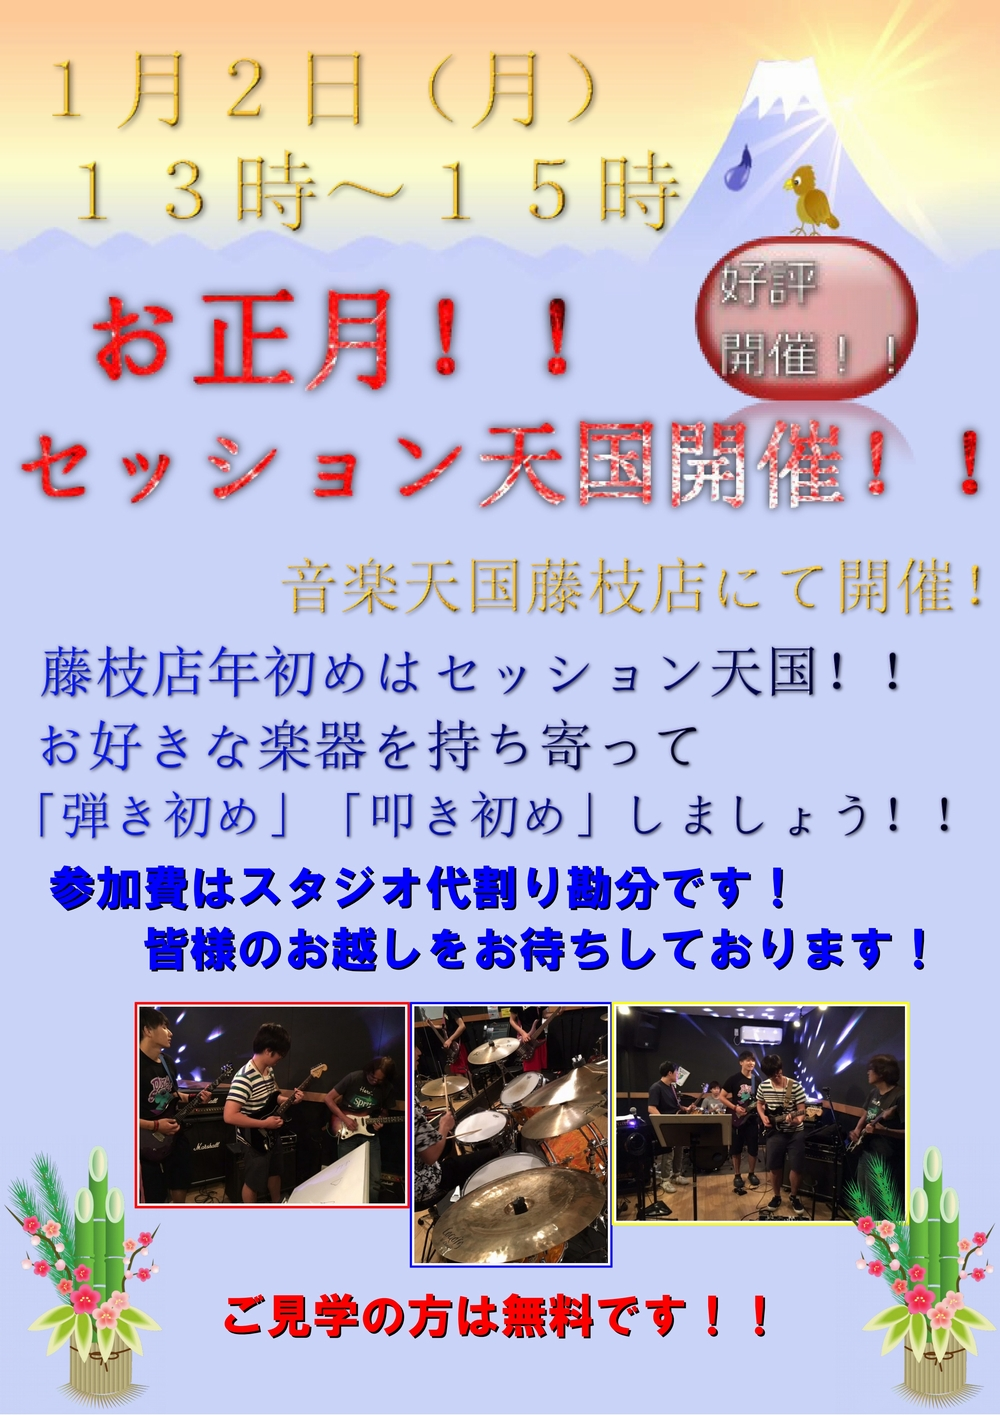 【お正月・セッション天国】音楽天国・藤枝店1月2日(月)新春開催!